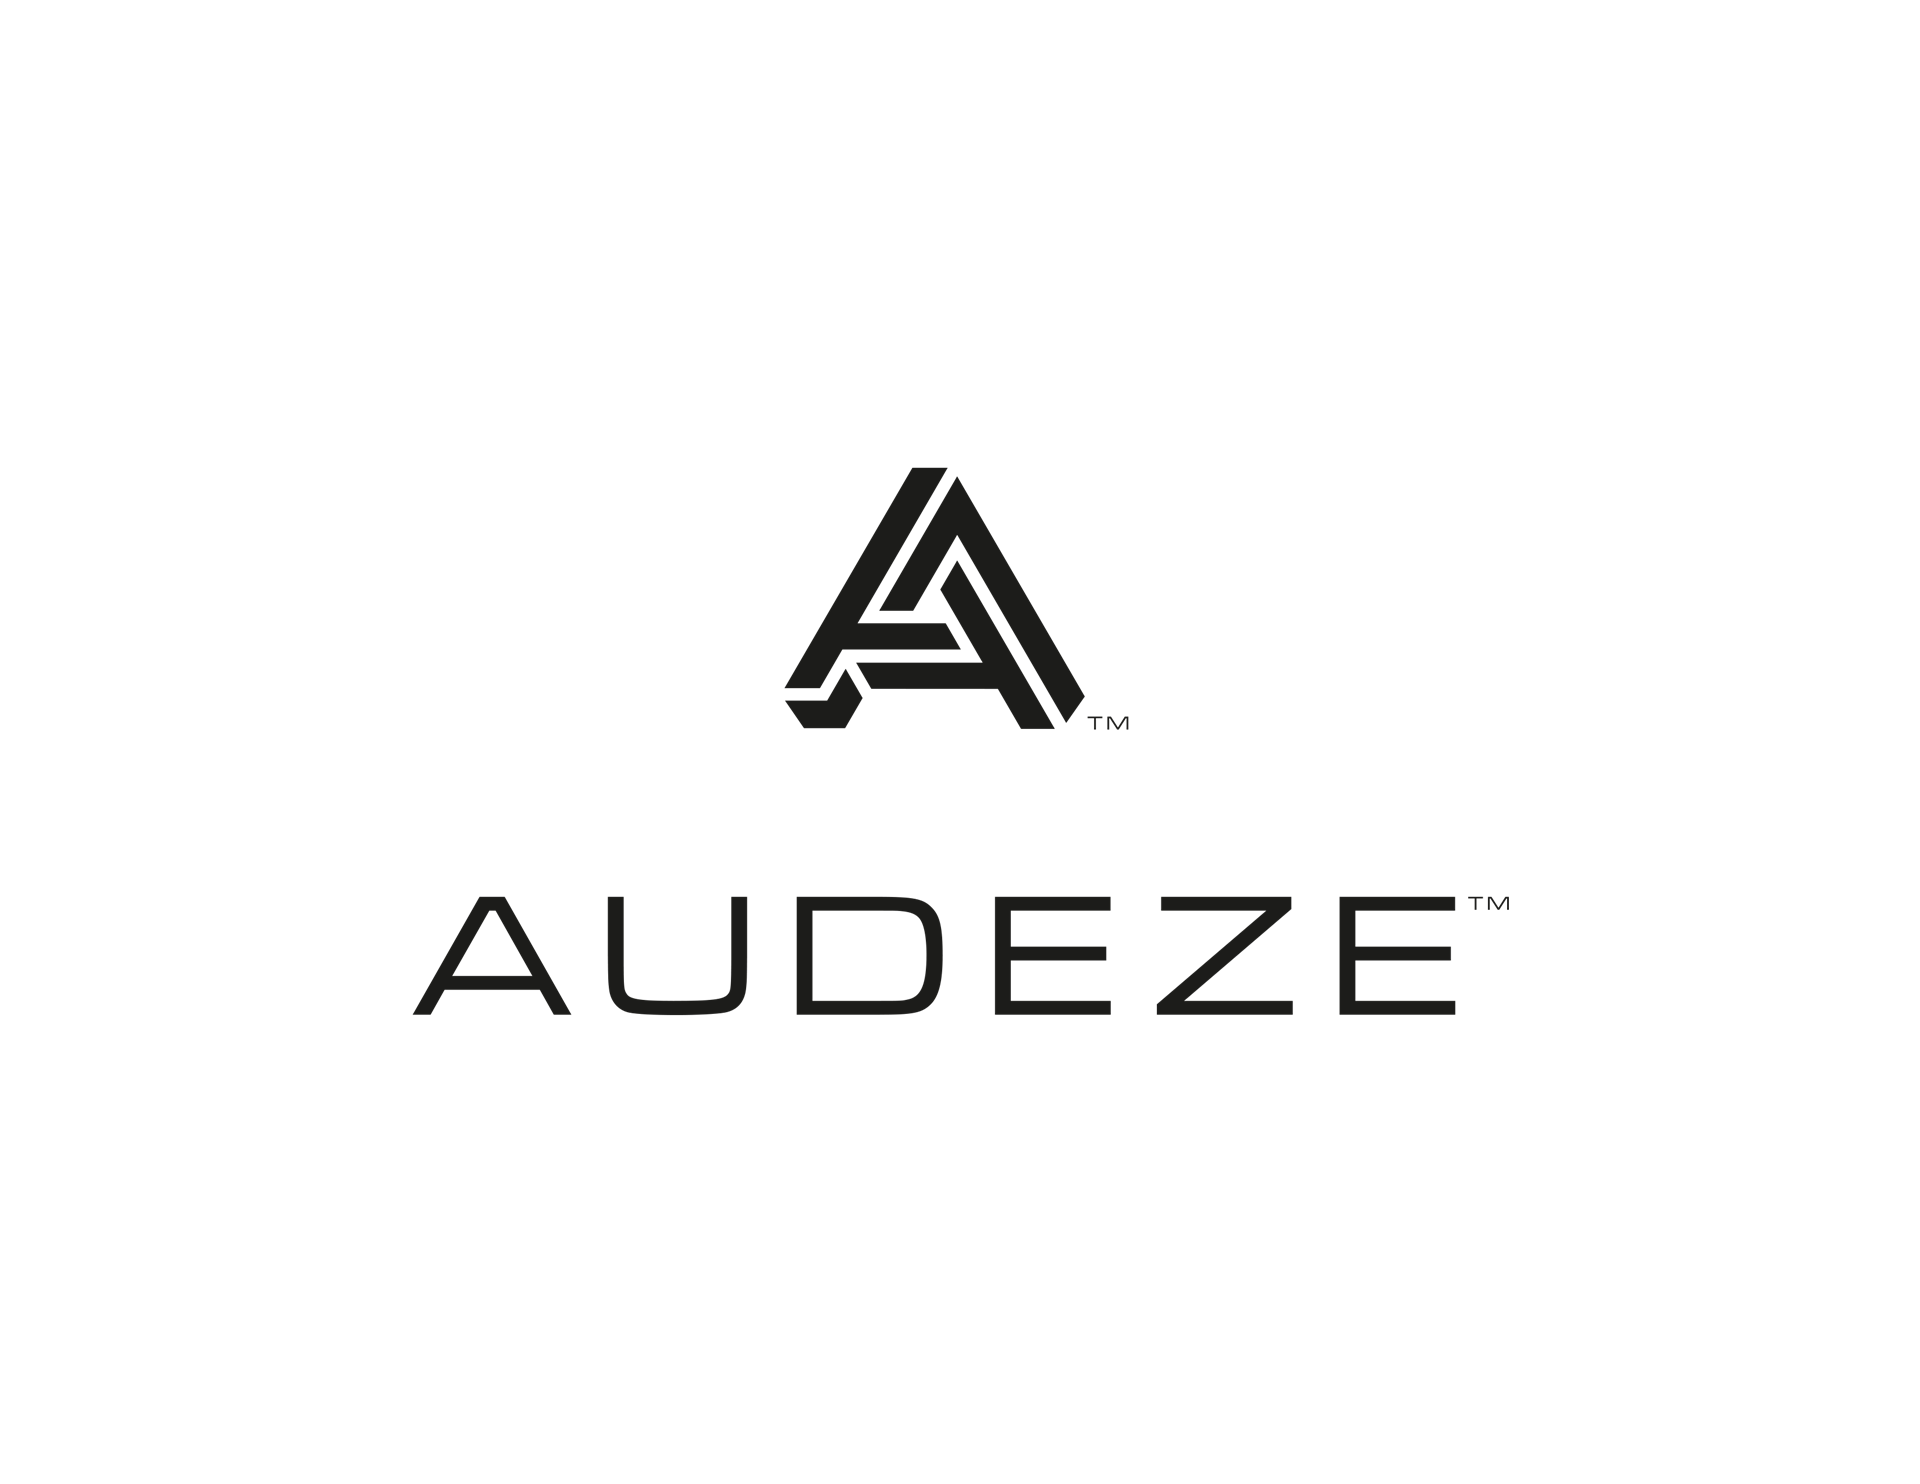 Audeze_Logo